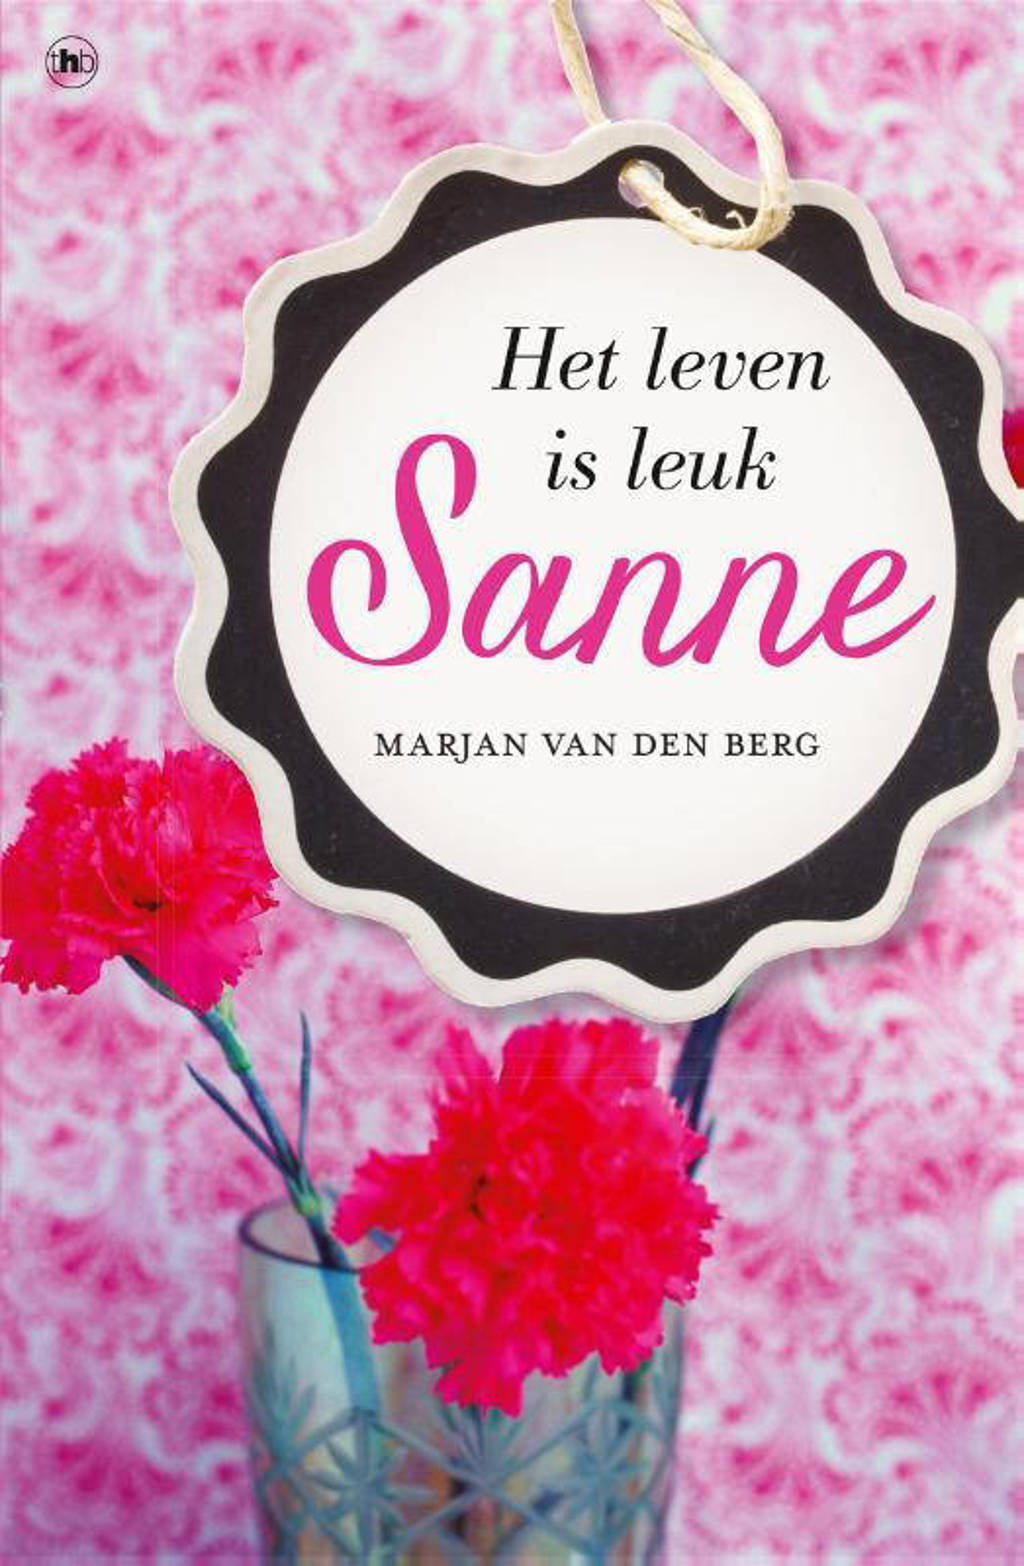 Sanne: Sanne - Marjan van den Berg